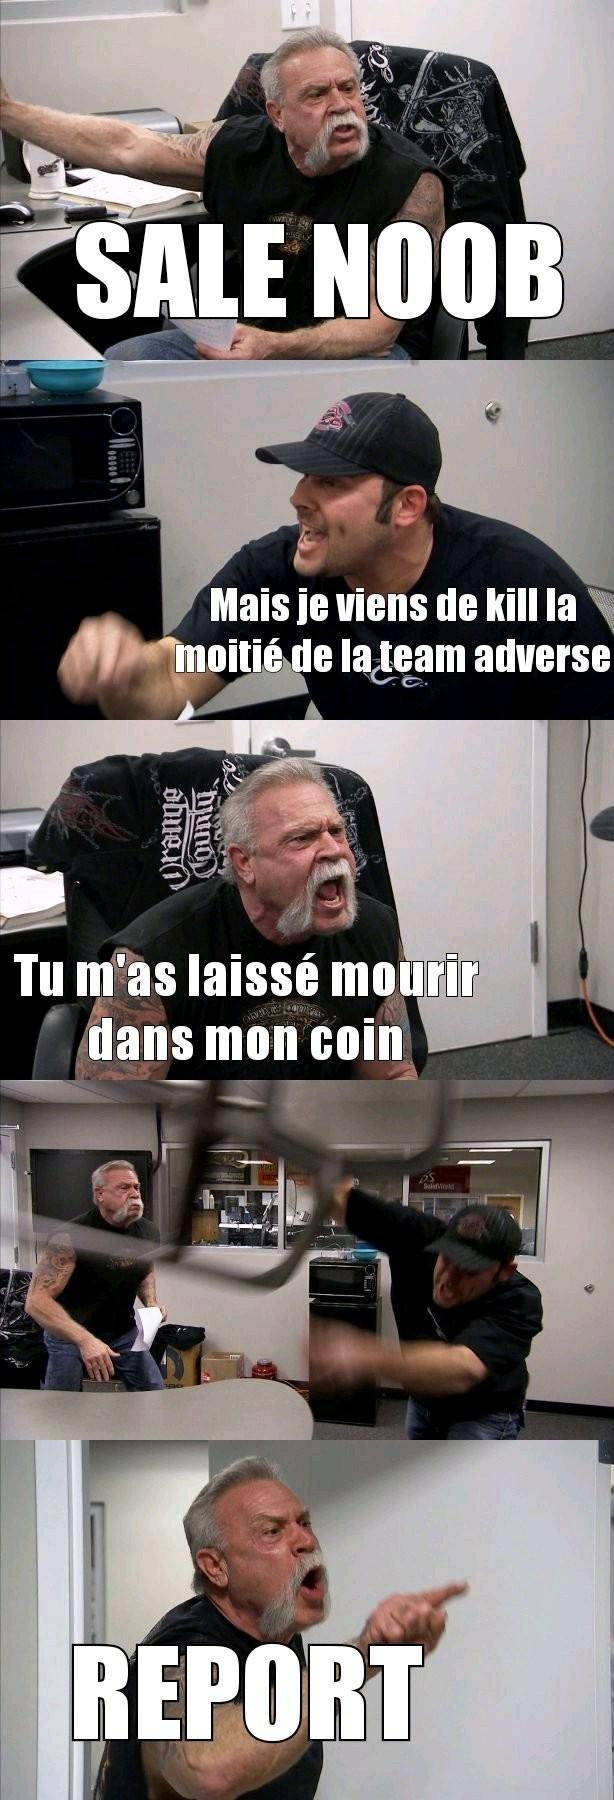 Ta game - meme